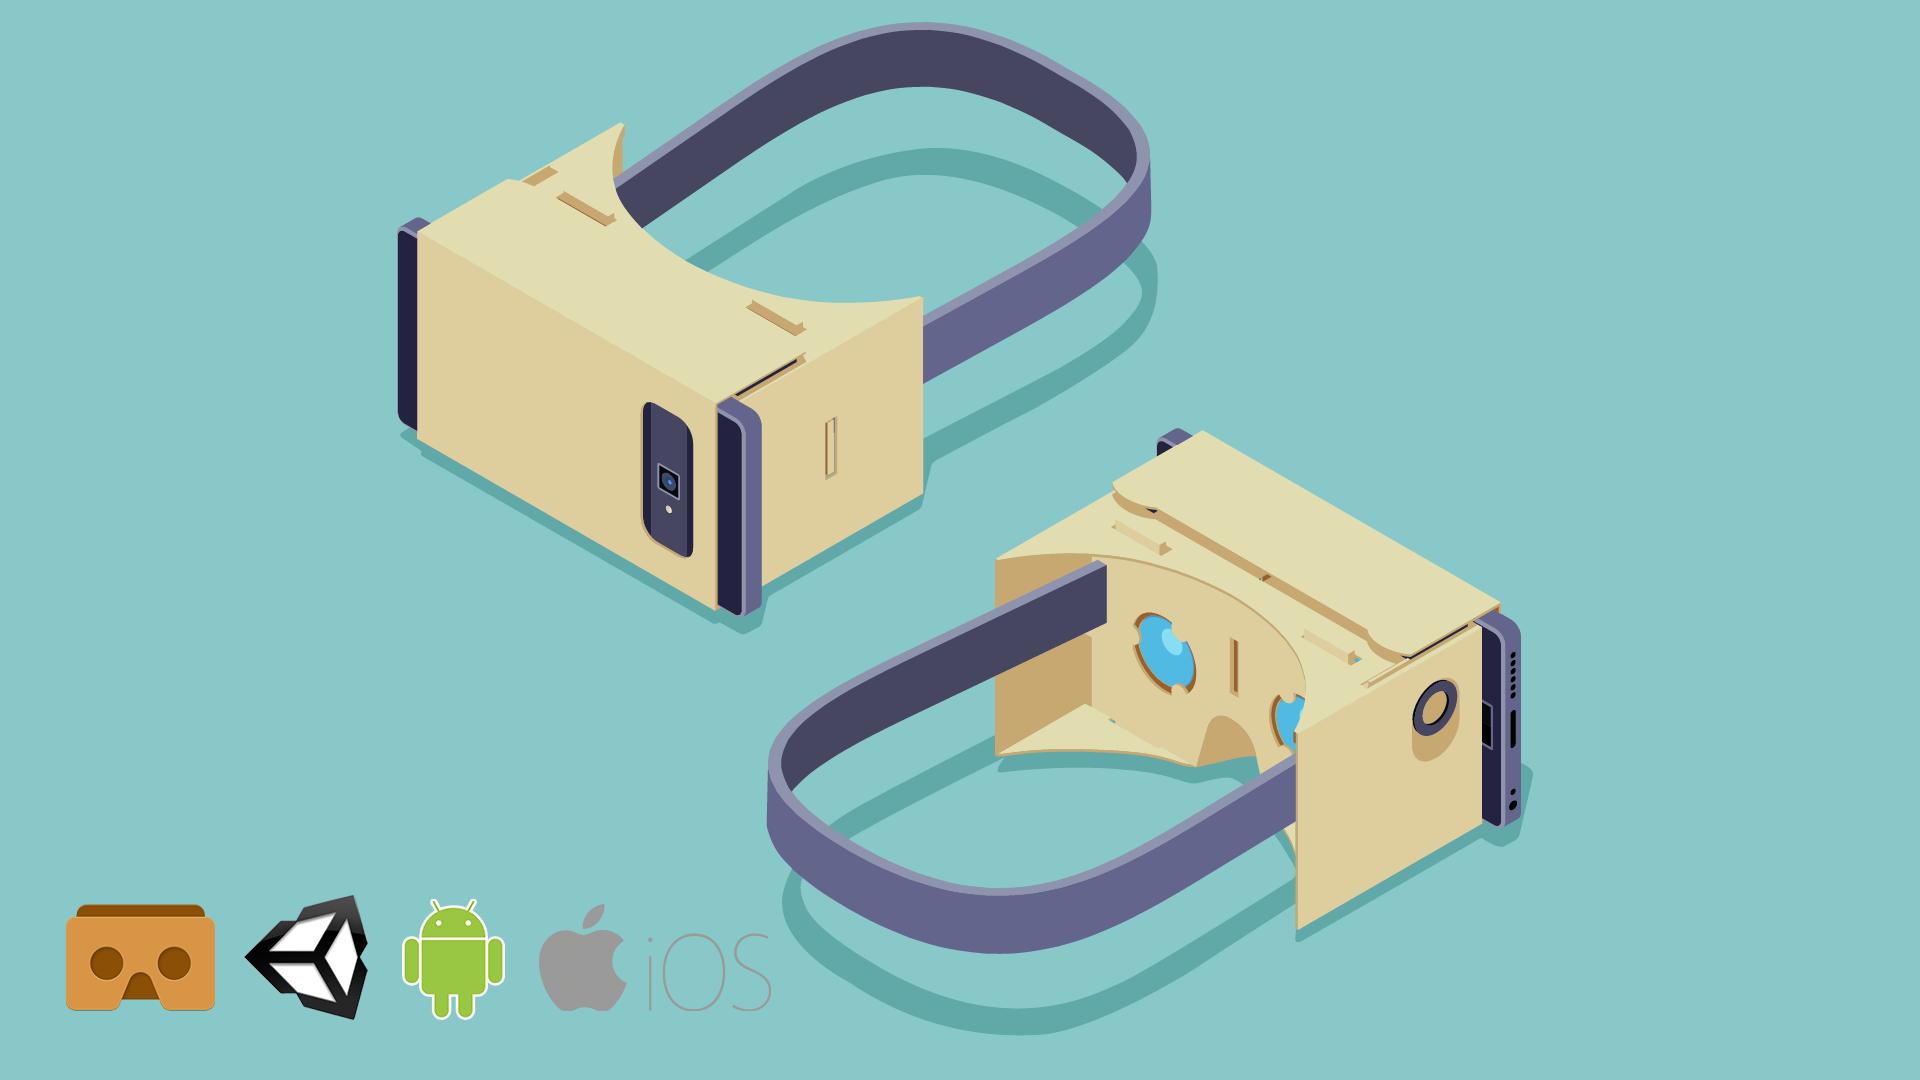 Become a Google Cardboard Developer